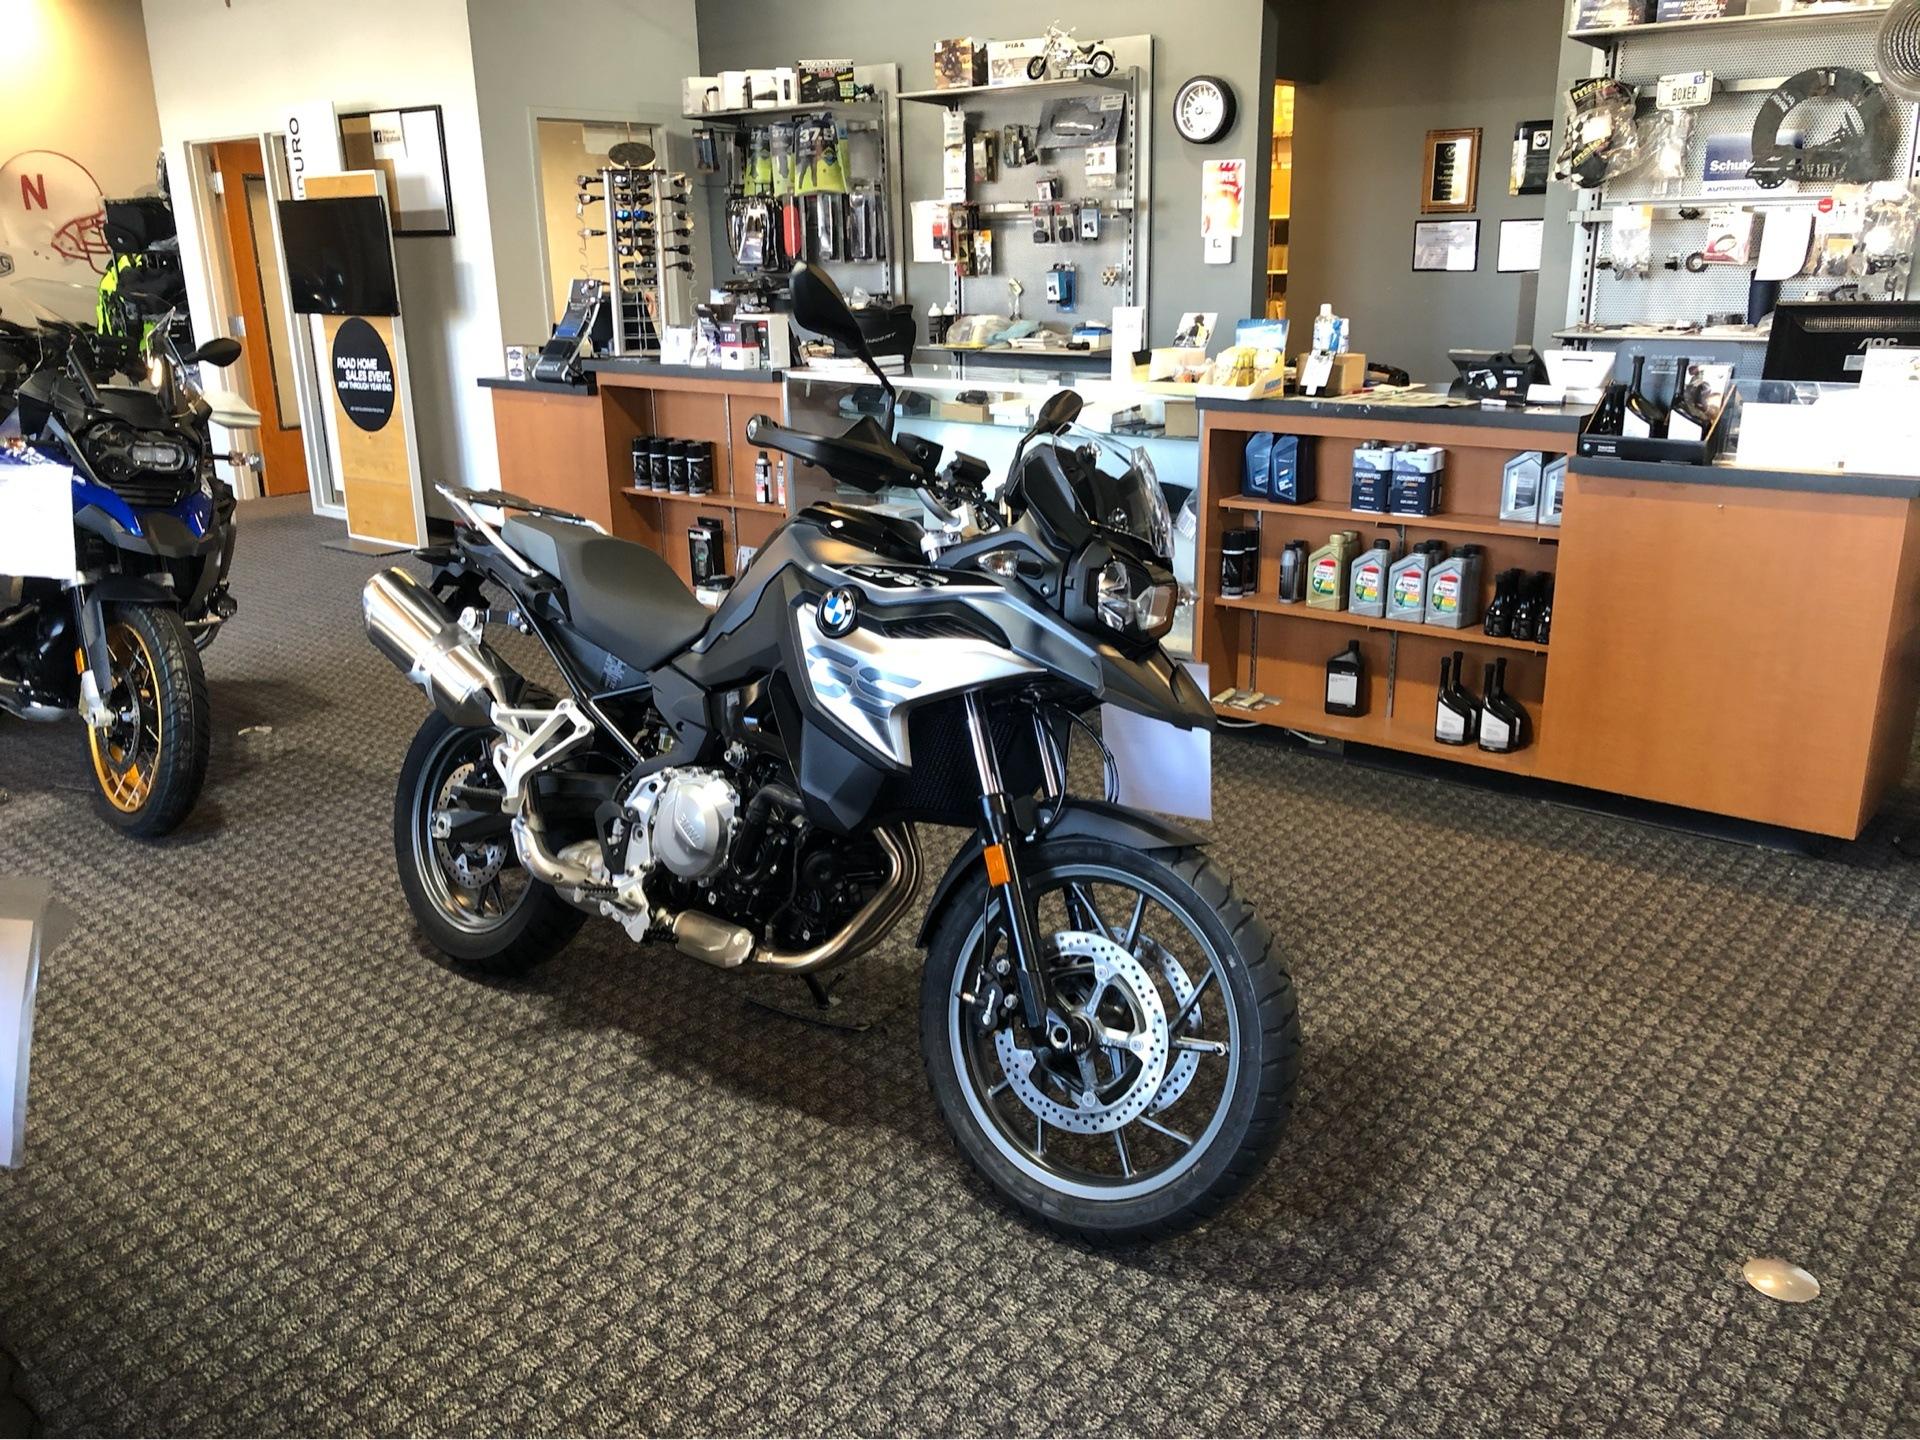 Nebraska Motorcycle Events 2020.2020 Bmw F750gs In Omaha Nebraska